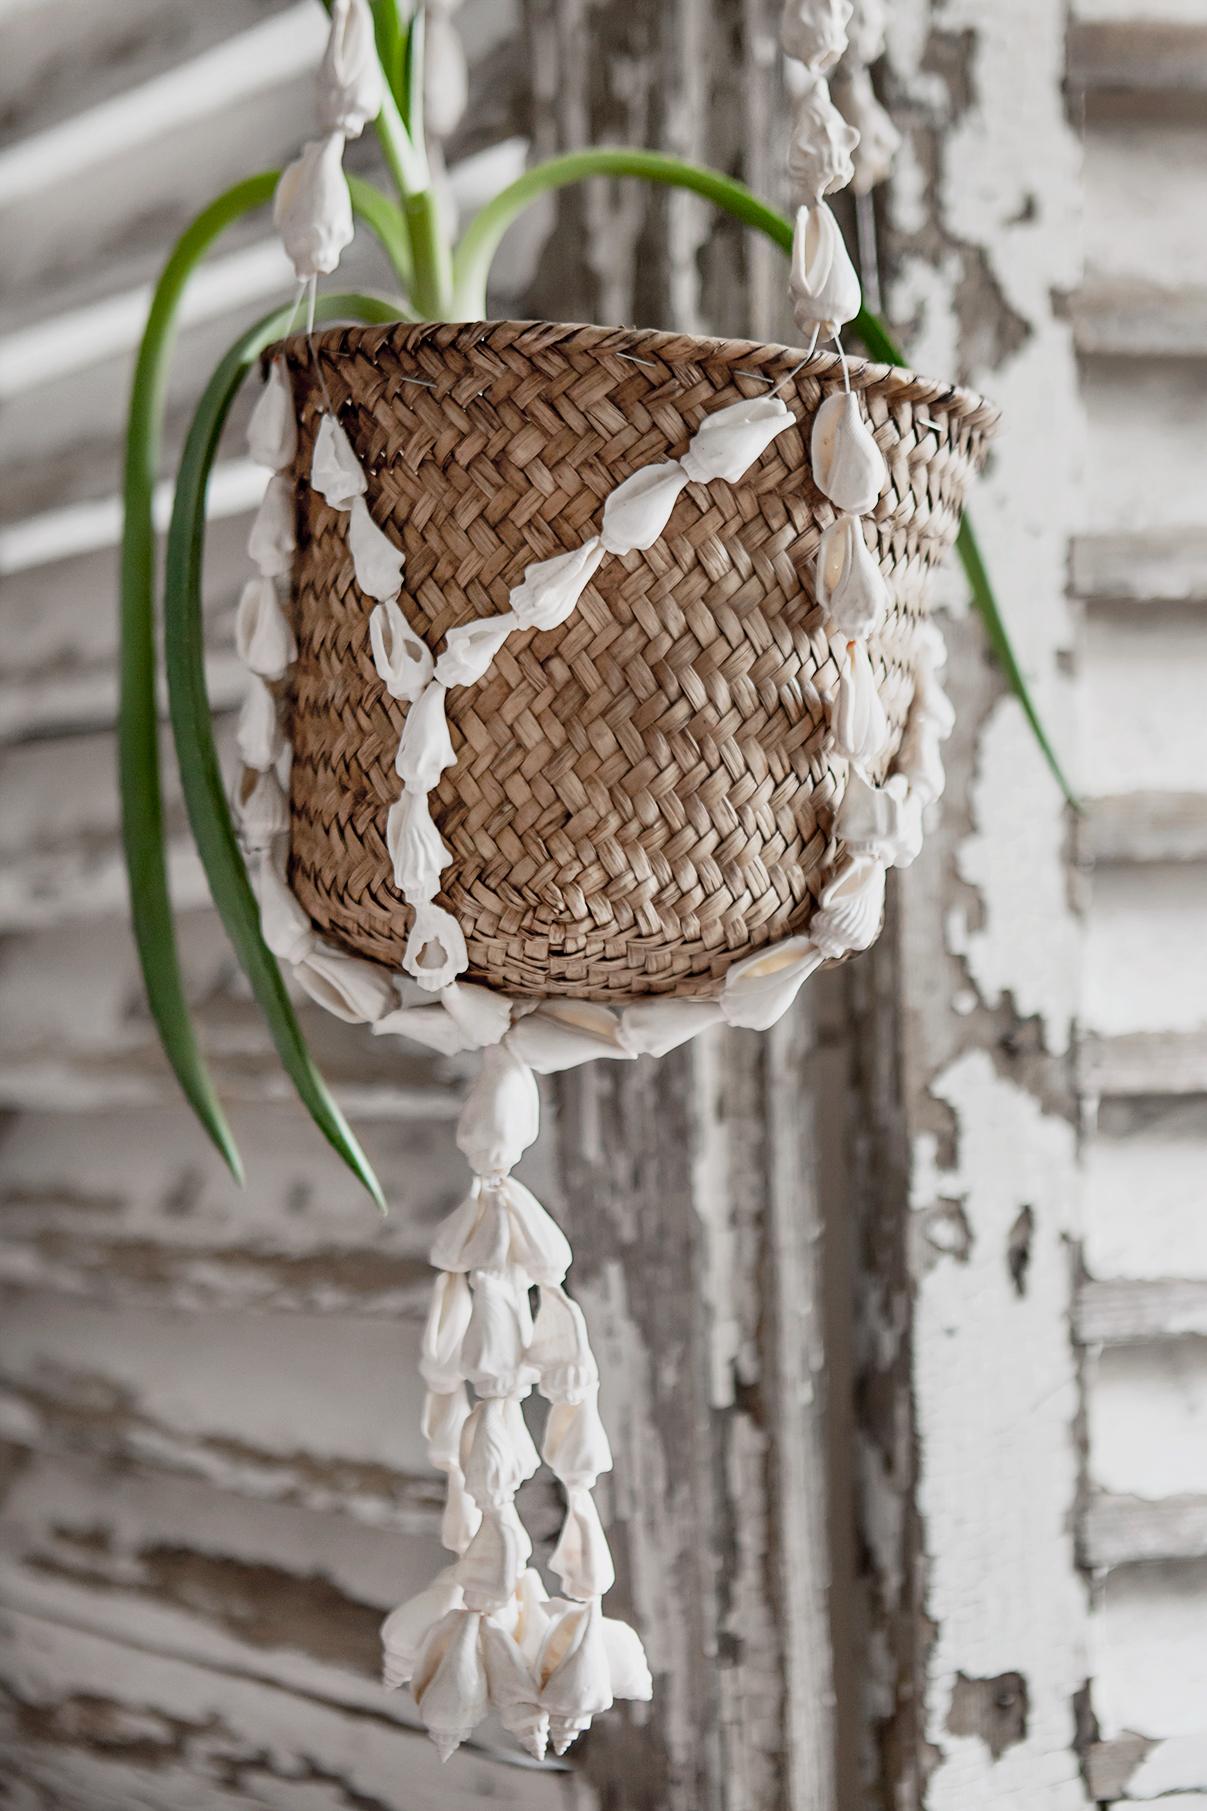 Hanger flowerpot copyright Anna Malmberg